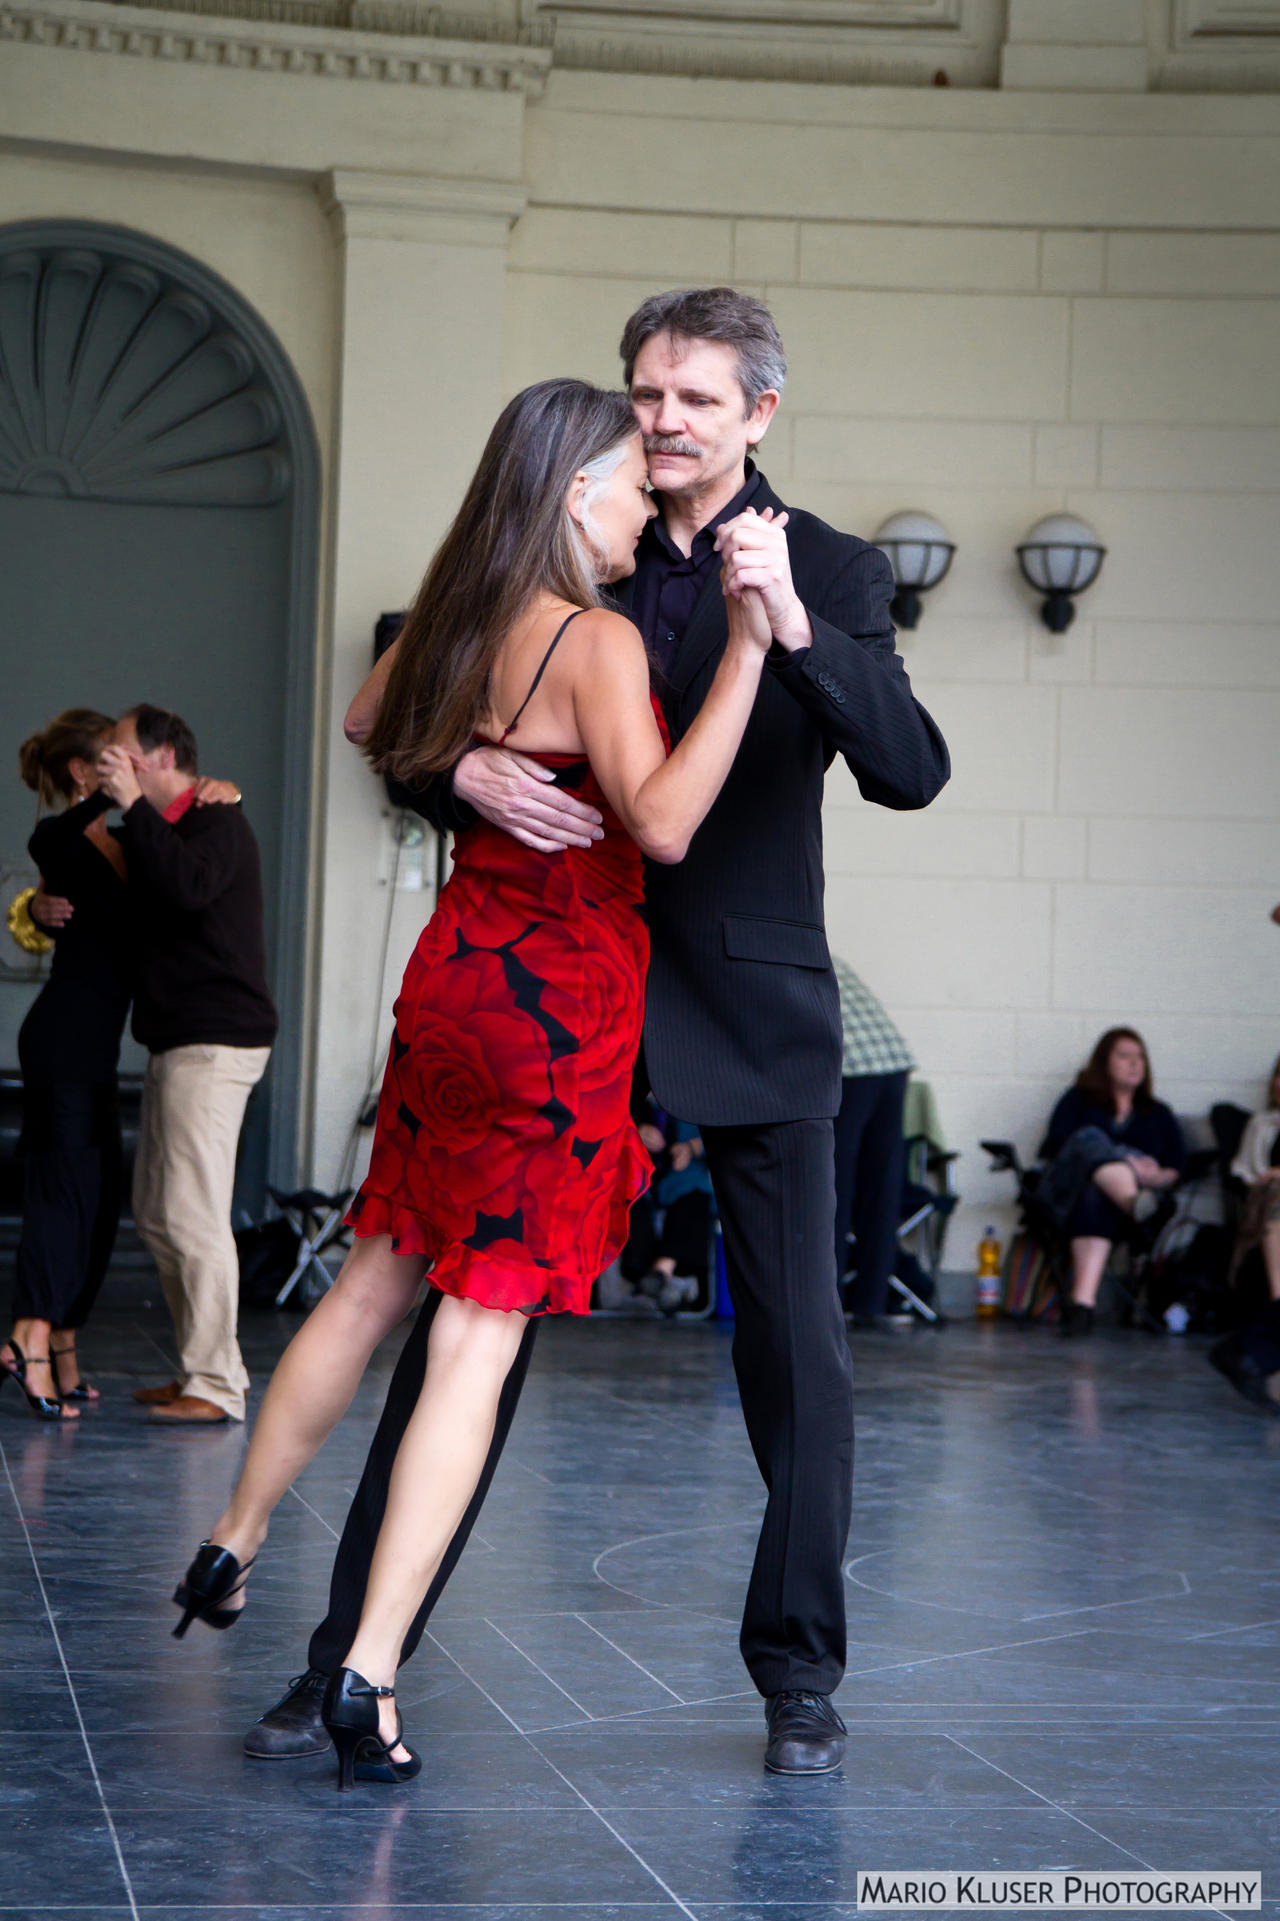 Tango at Elisenbrunnen (Aachen - Germany)